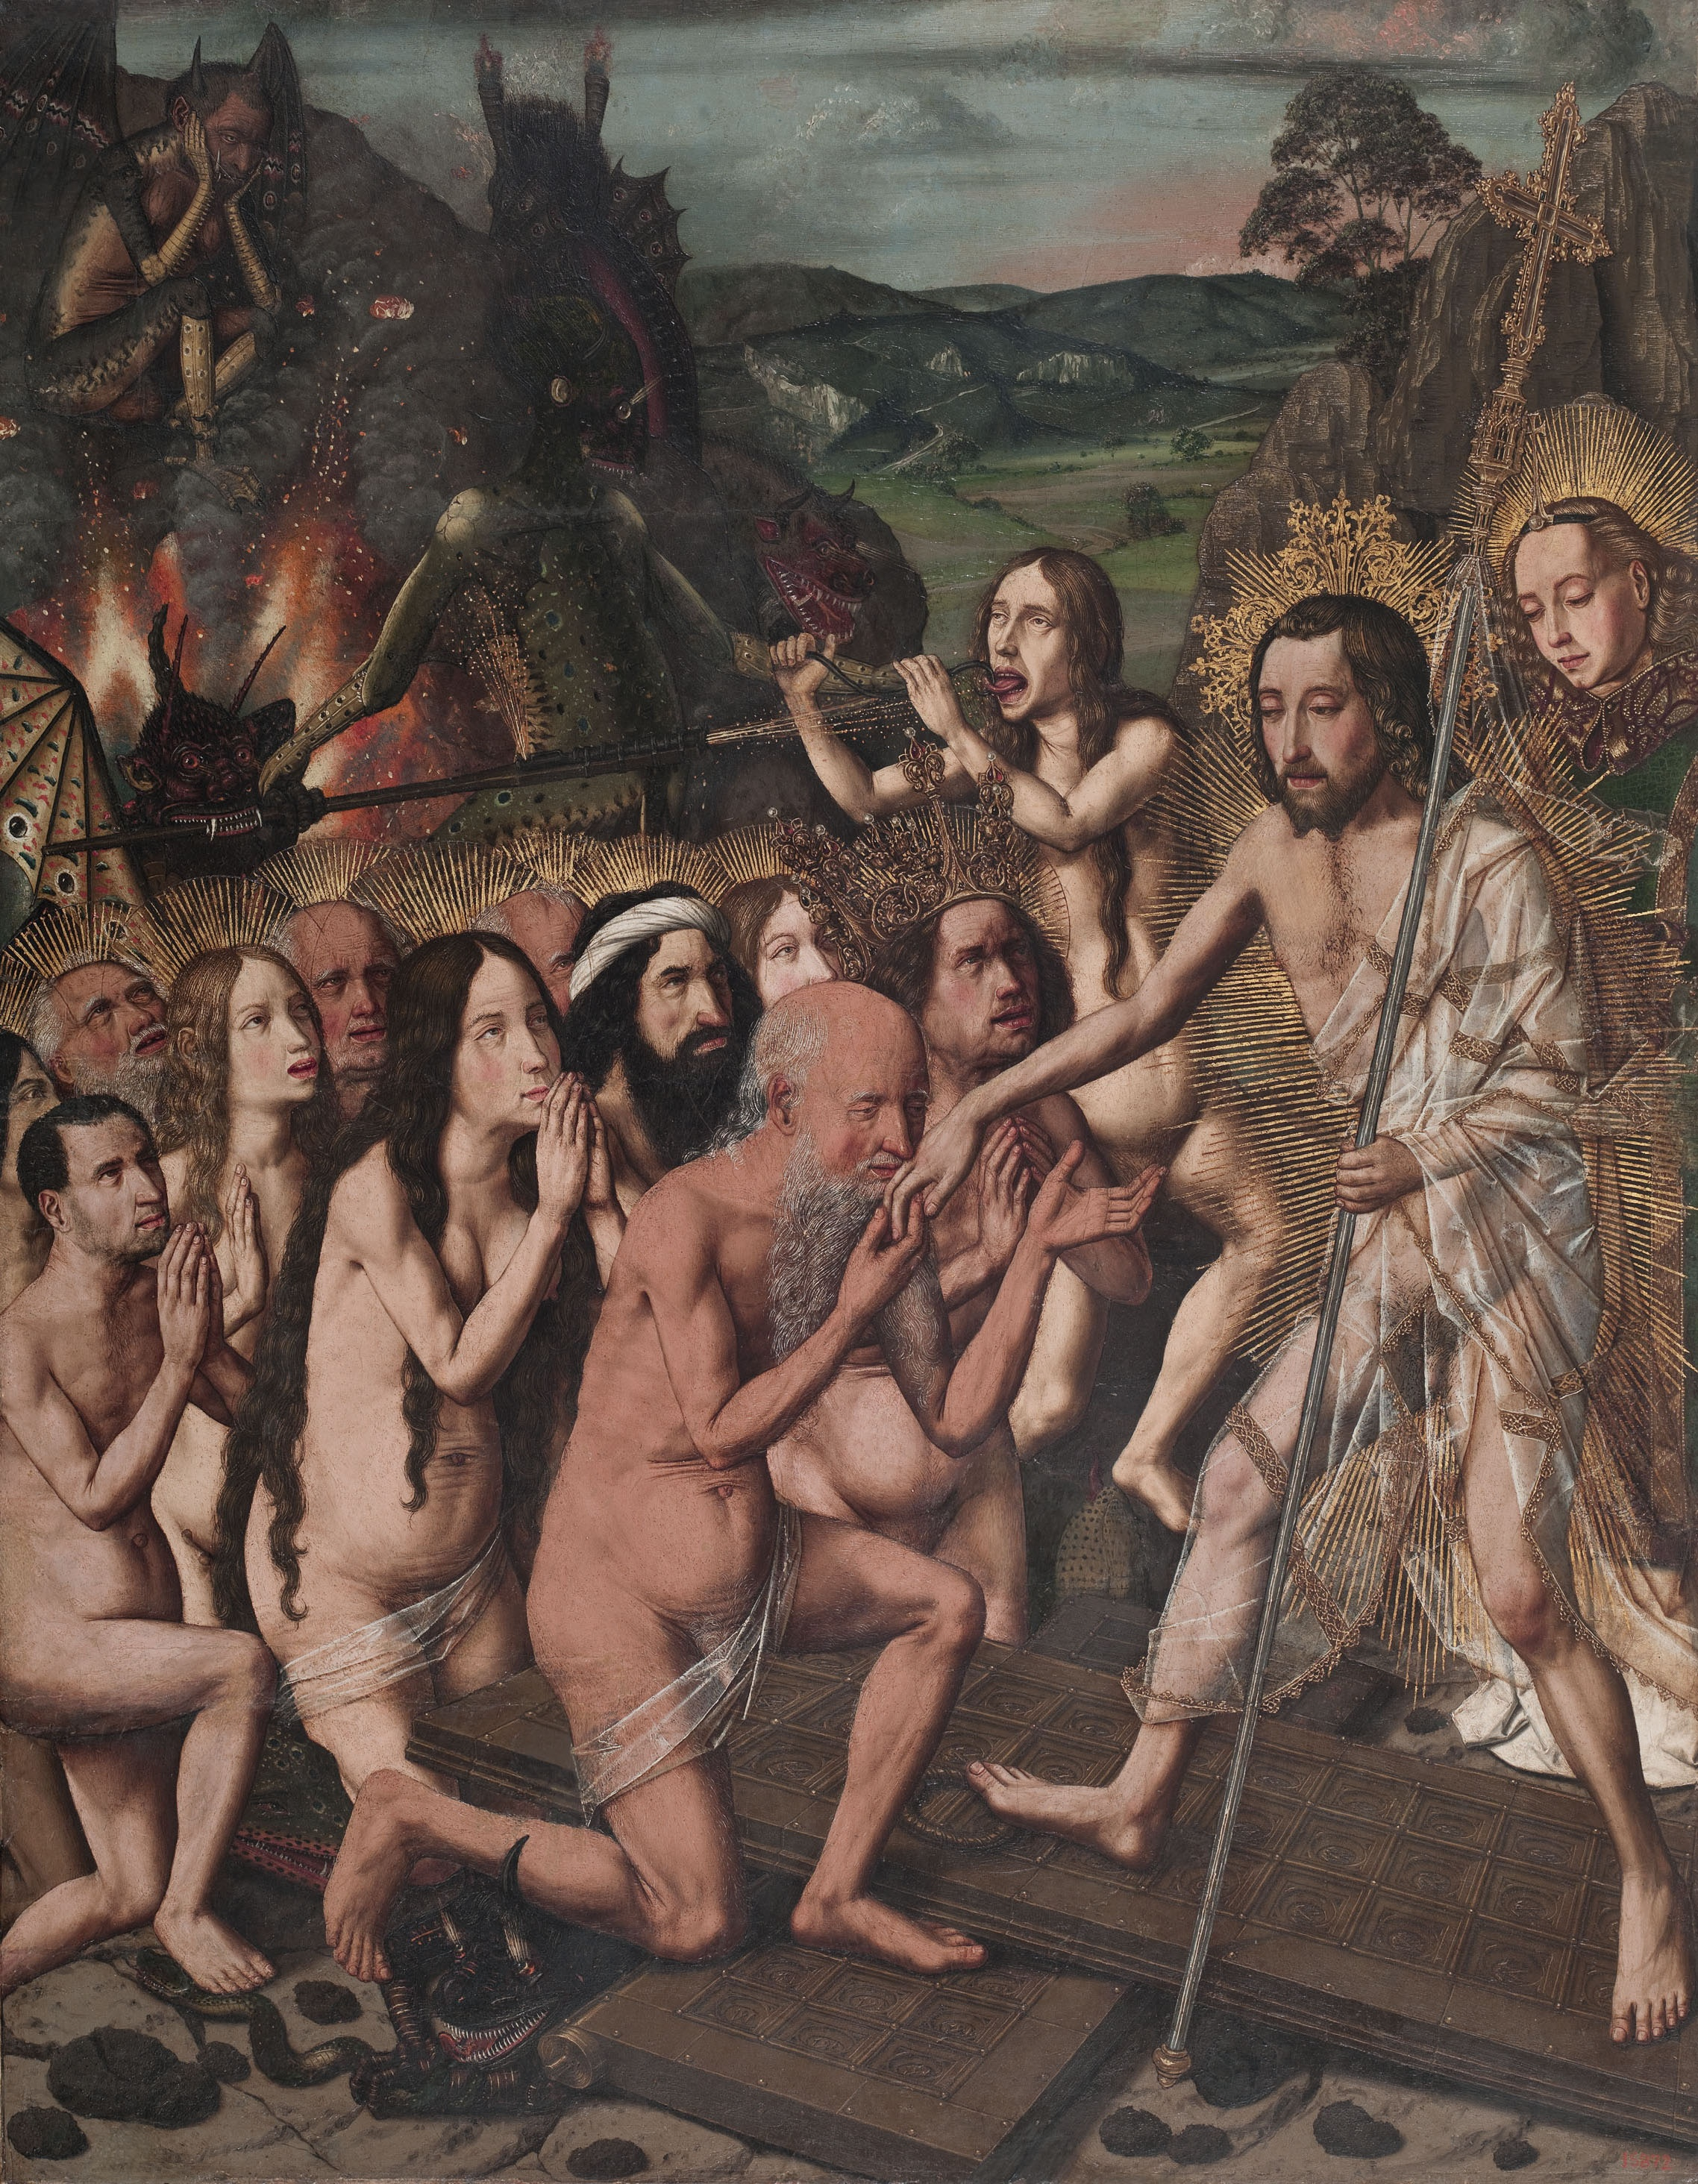 Descenso de Cristo al Limbo, Bartolomé Bermejo, hacia 1475